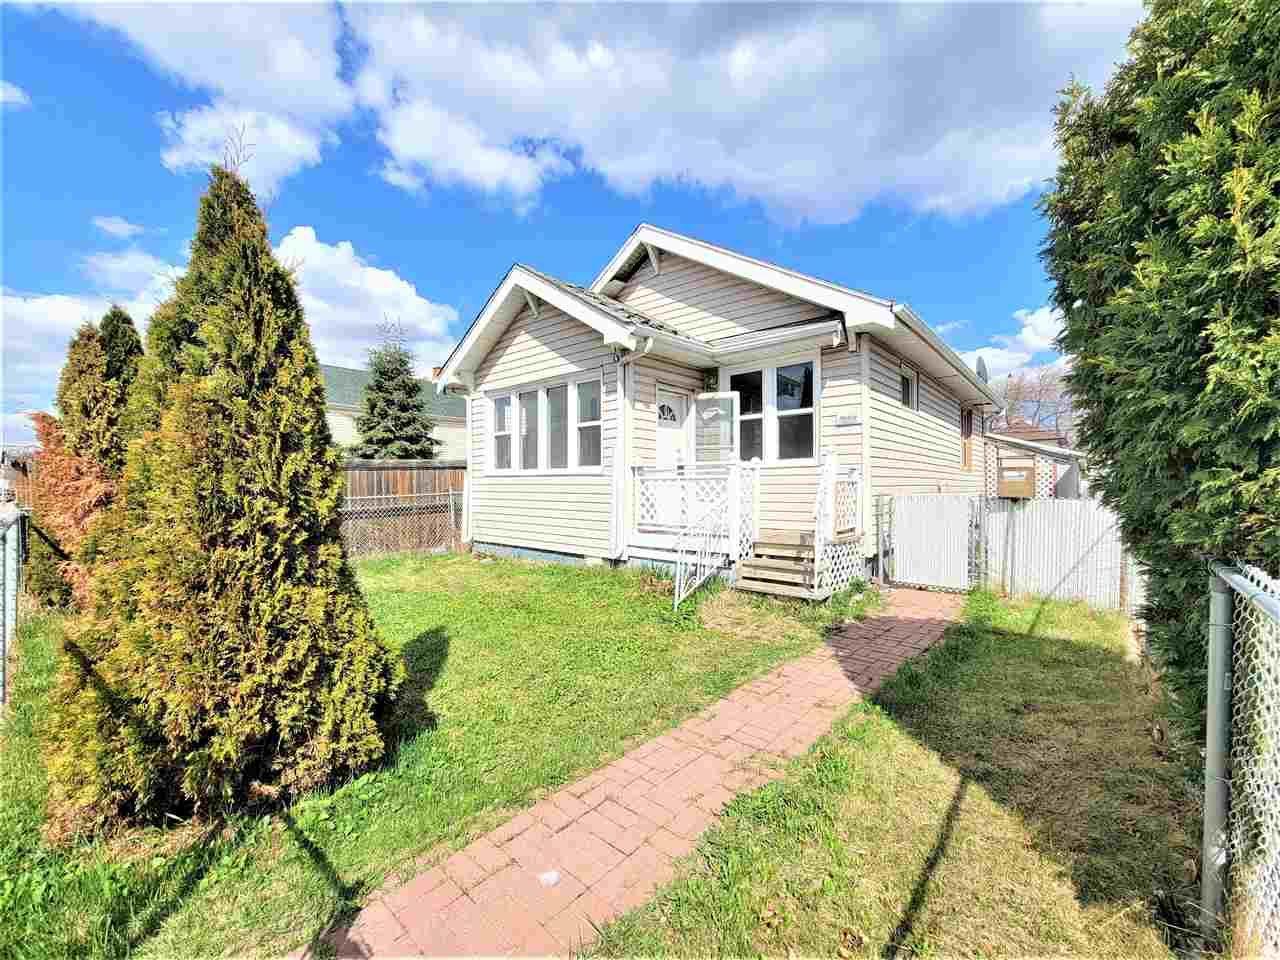 Main Photo: 11529 95 Street in Edmonton: Zone 05 House for sale : MLS®# E4243301